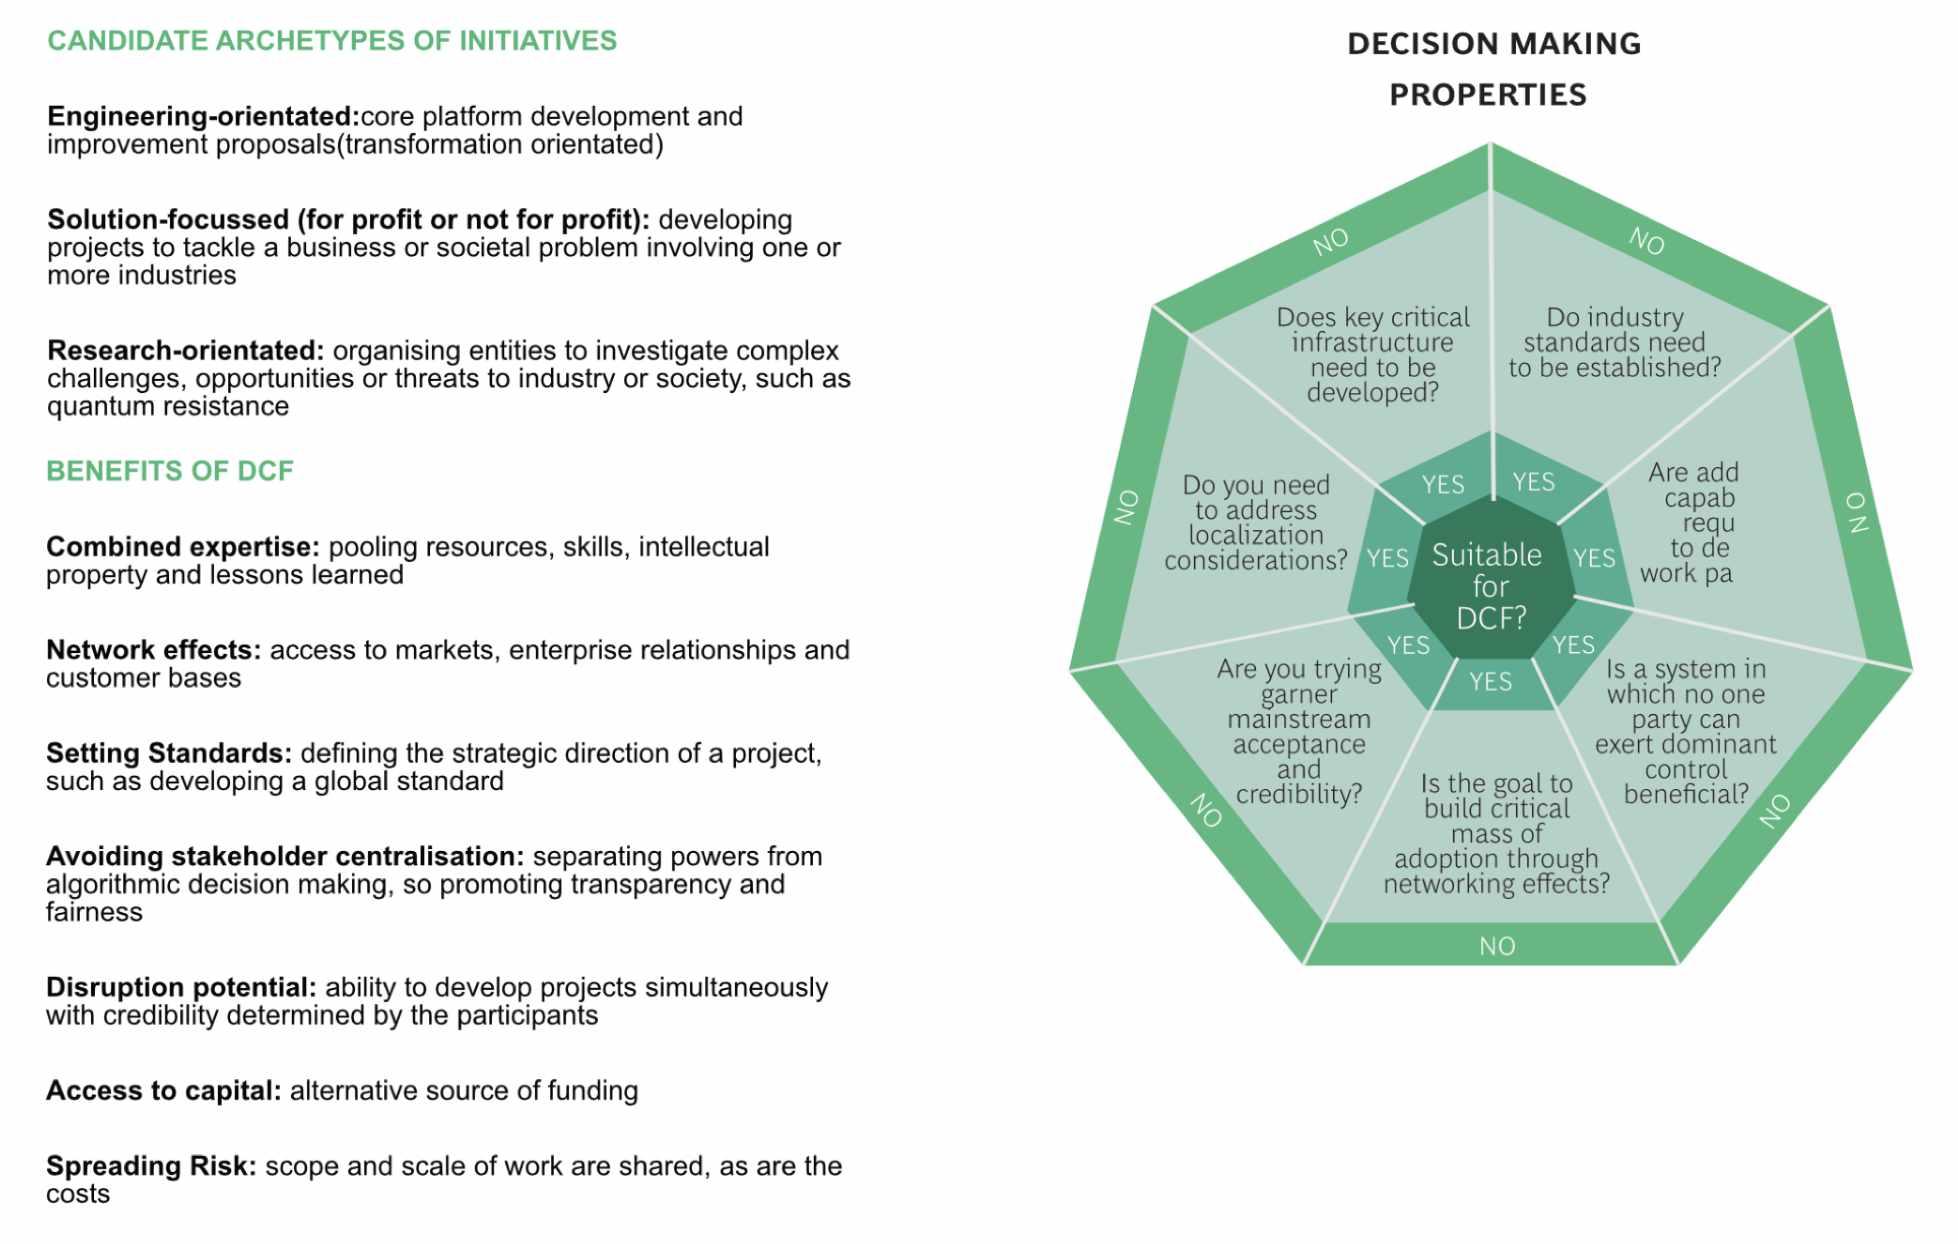 sdgs, goals, identified, governance, conflict,